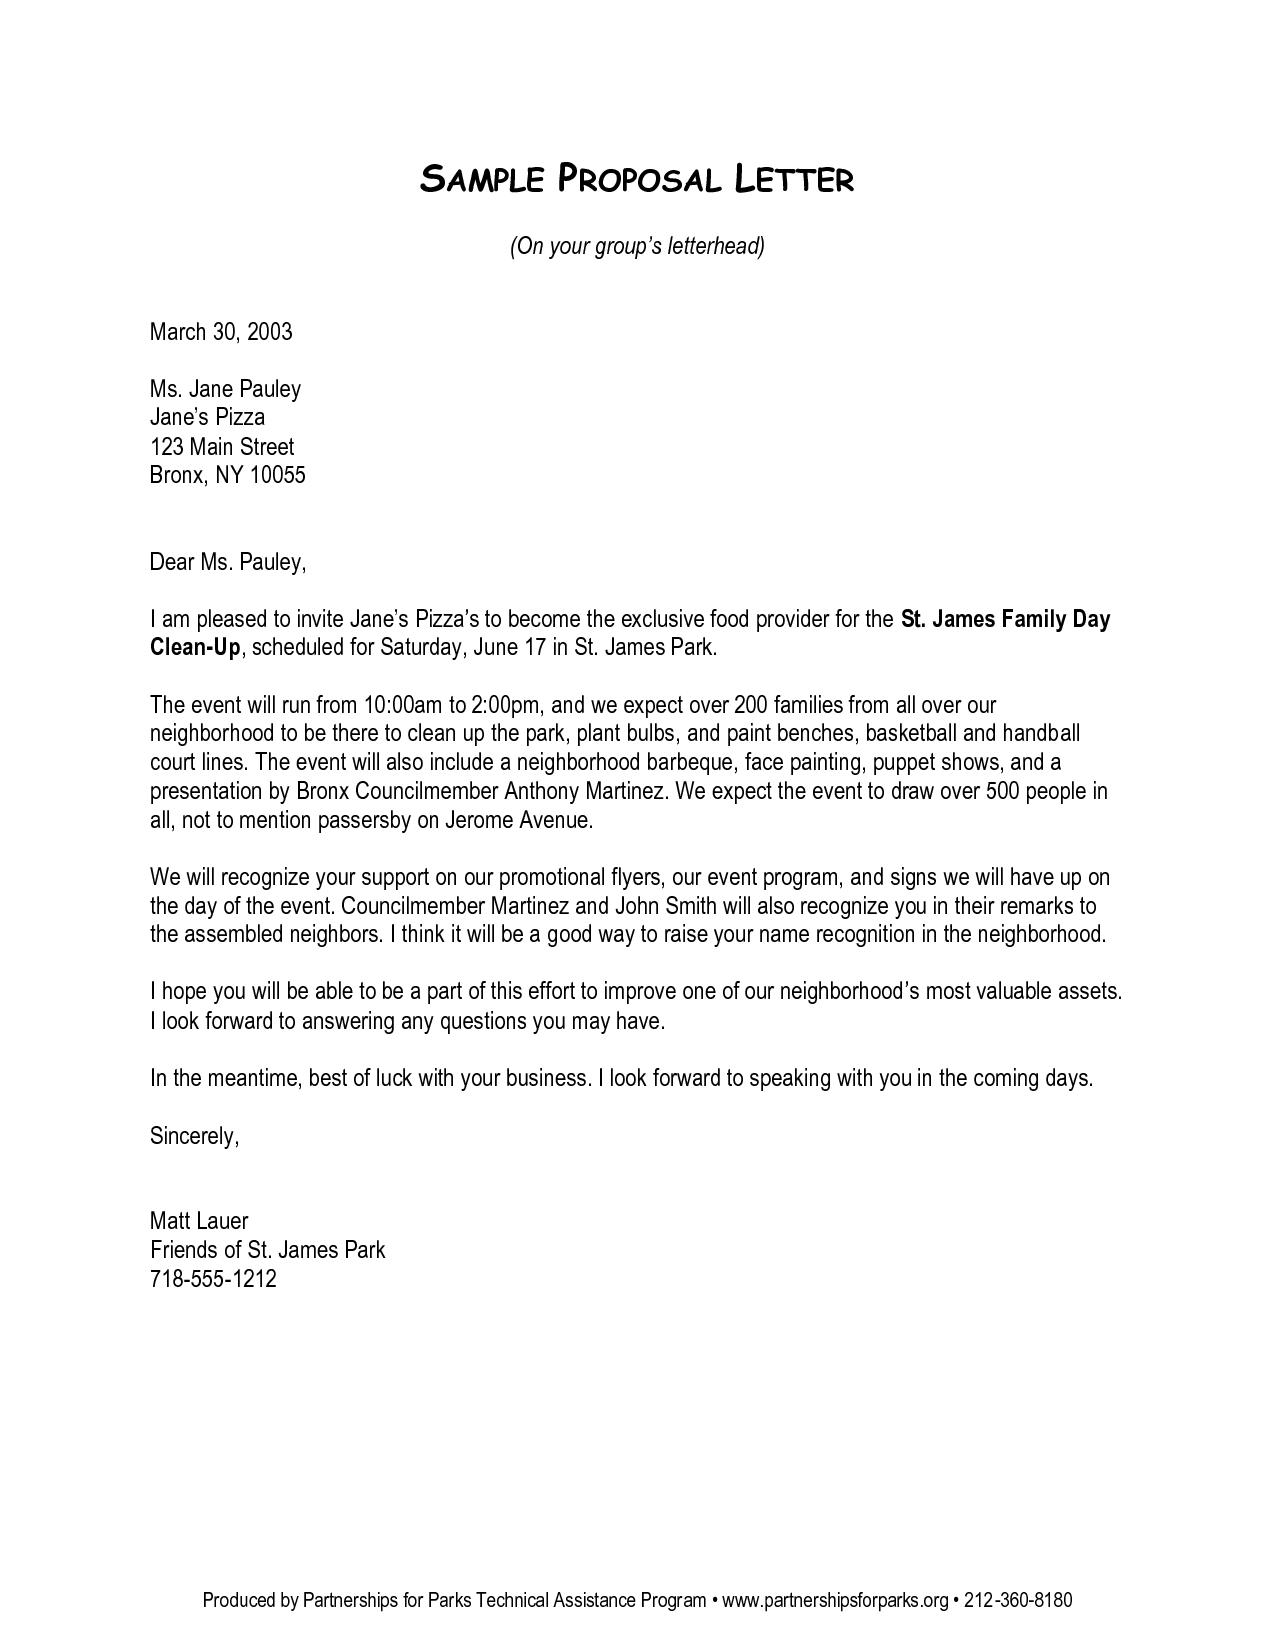 Business Letter Proposal  Cover Letter Sample For Job Application